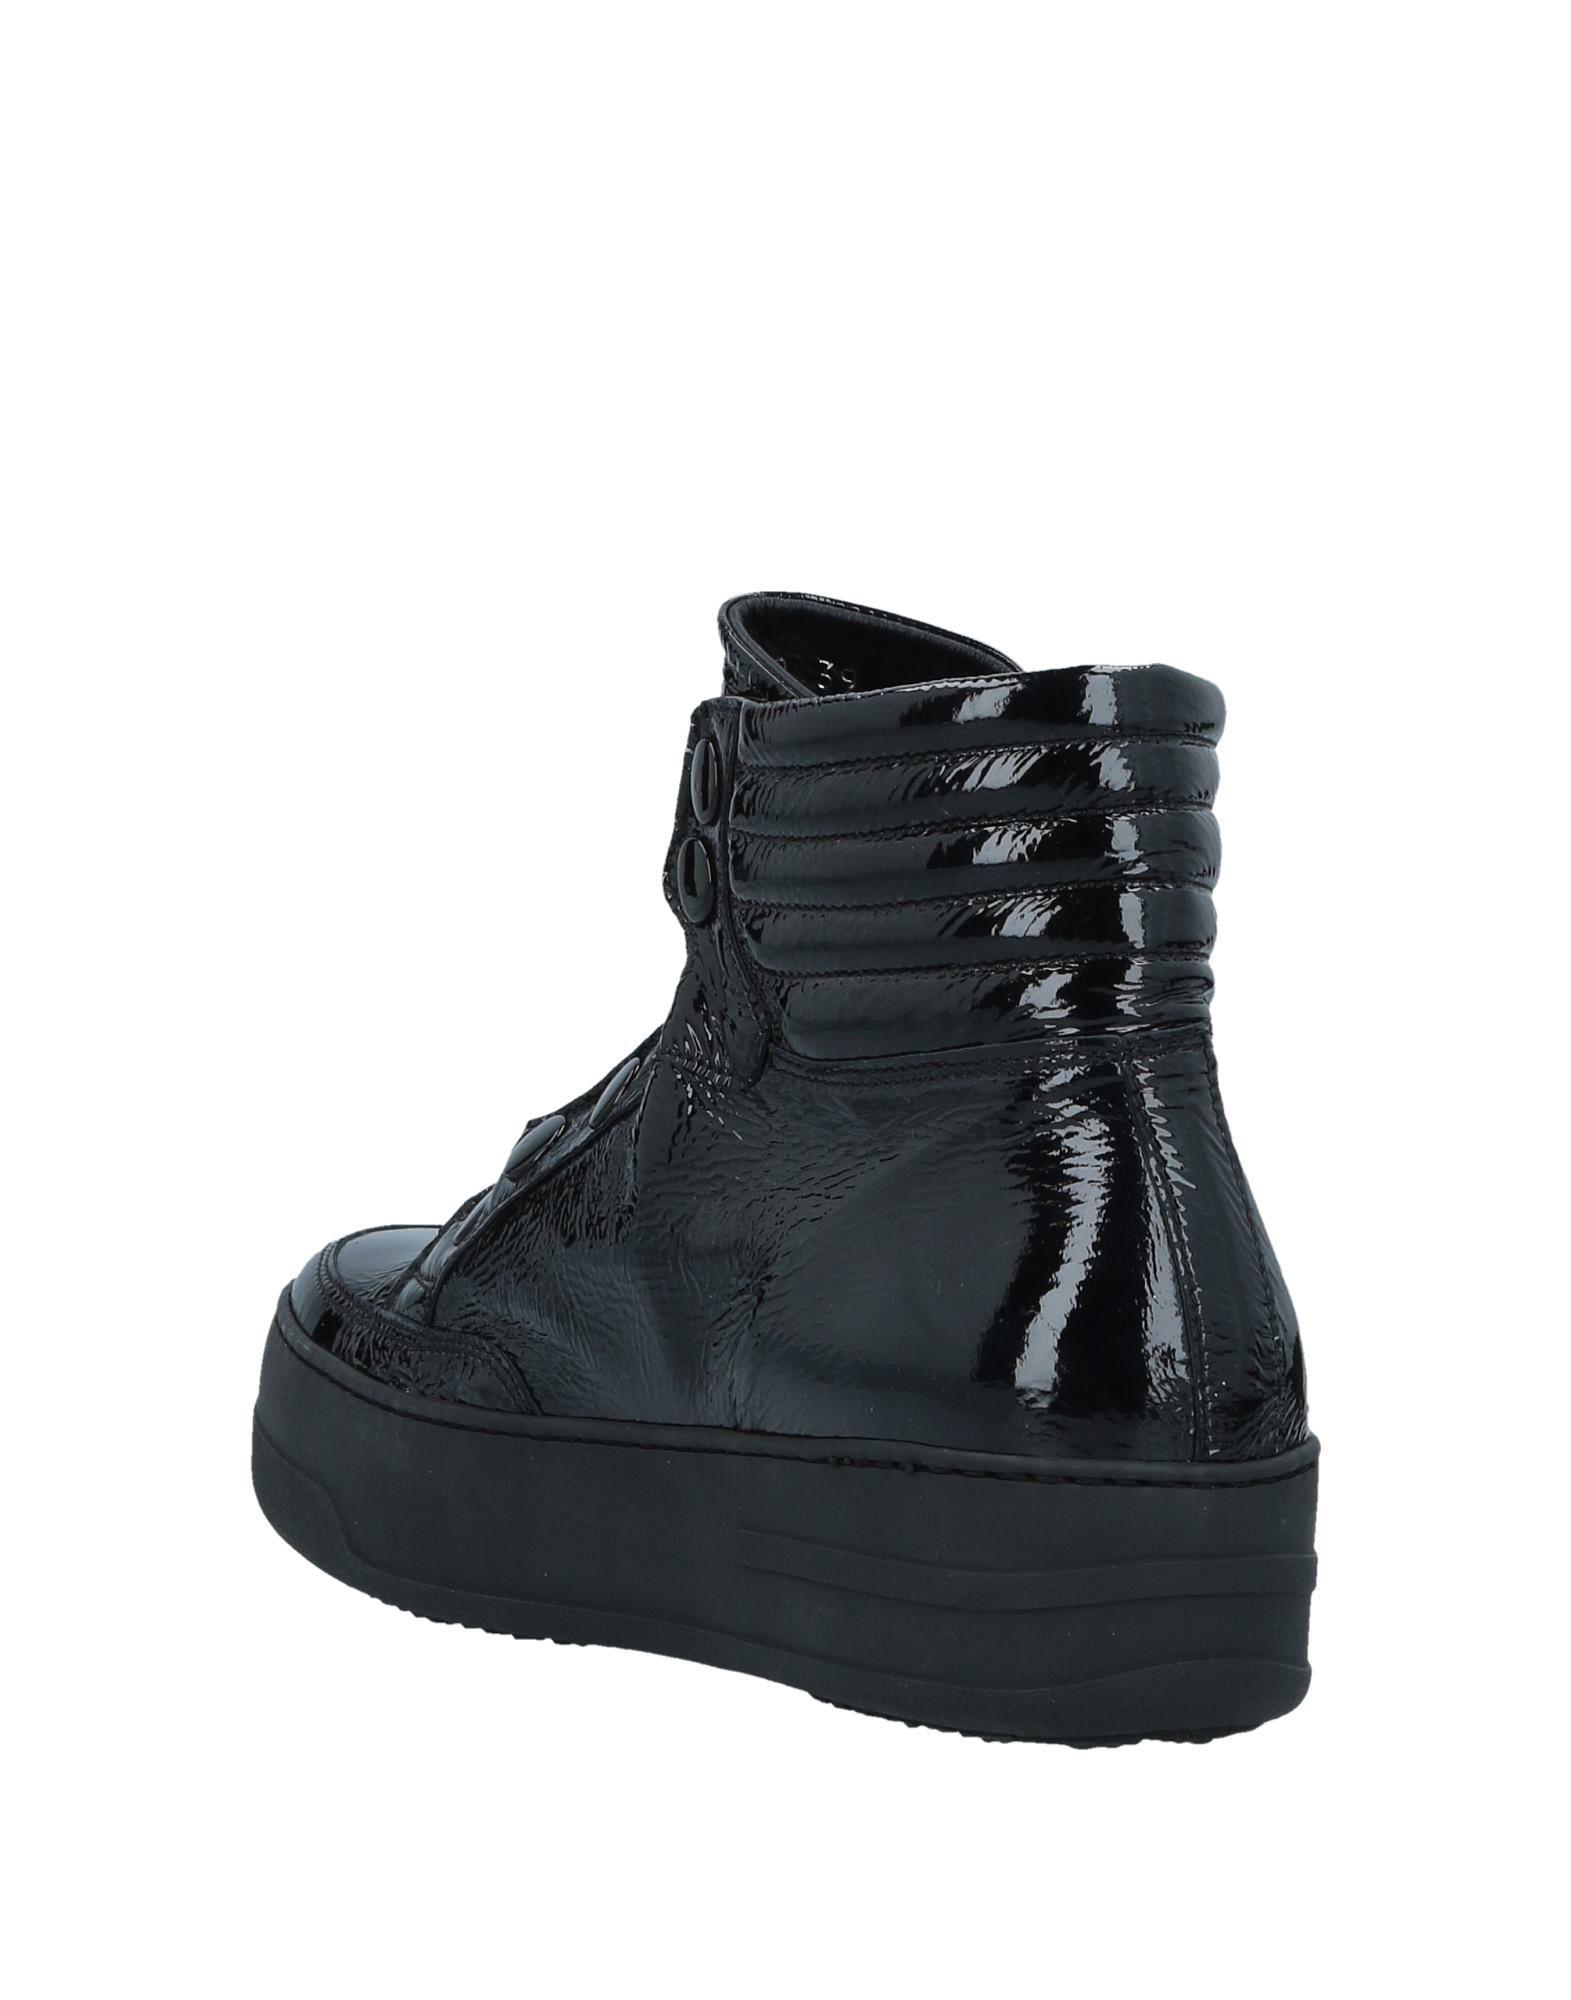 Bruno Bruno Bruno Bordese Sneakers Damen  11534574QKGut aussehende strapazierfähige Schuhe 3741c1